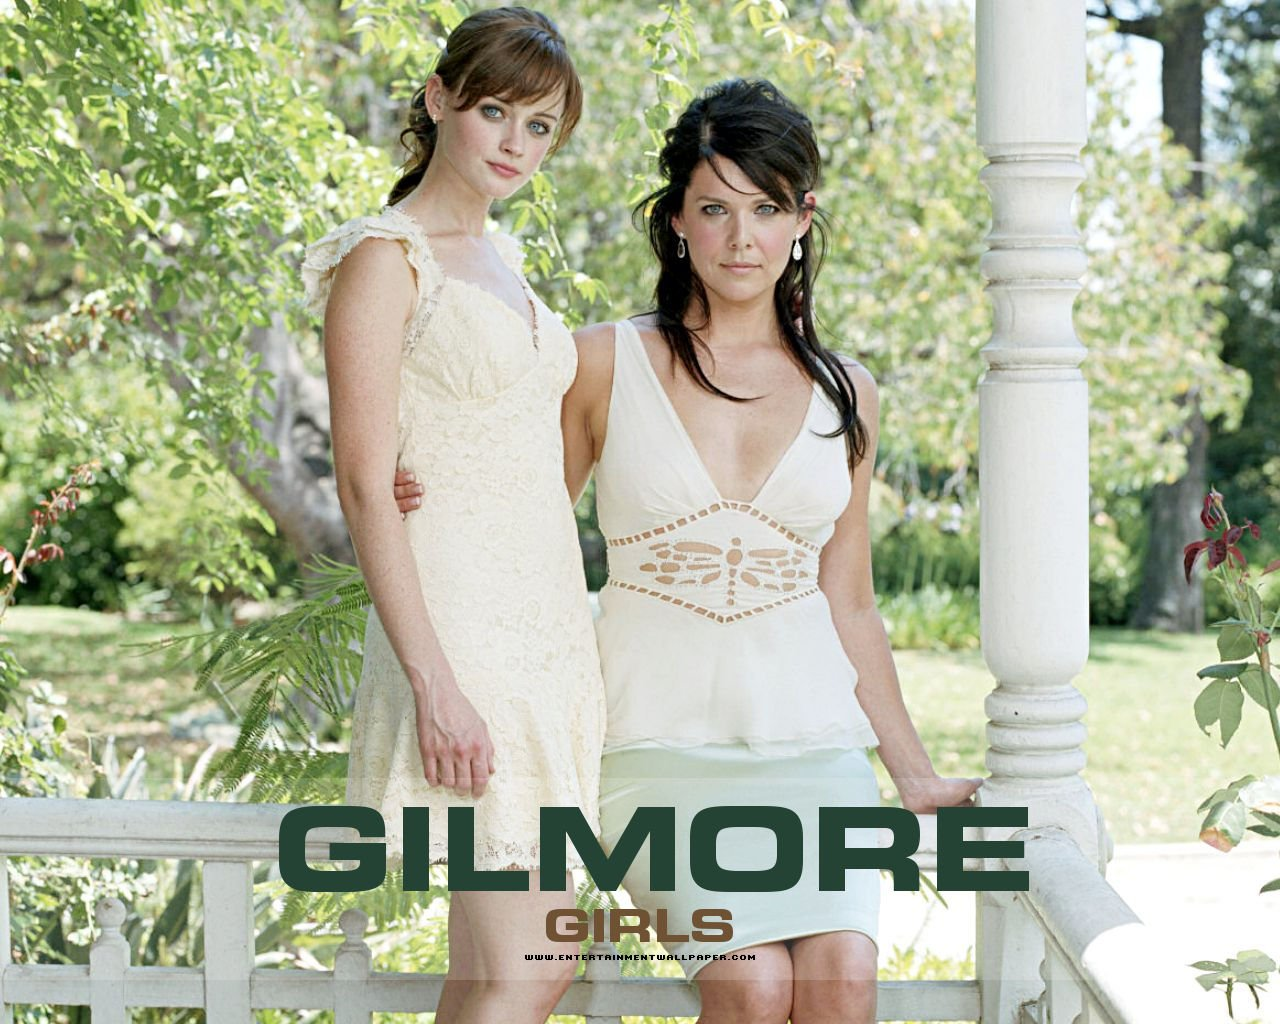 Netflix riporta in vita le Gilmore Girls!